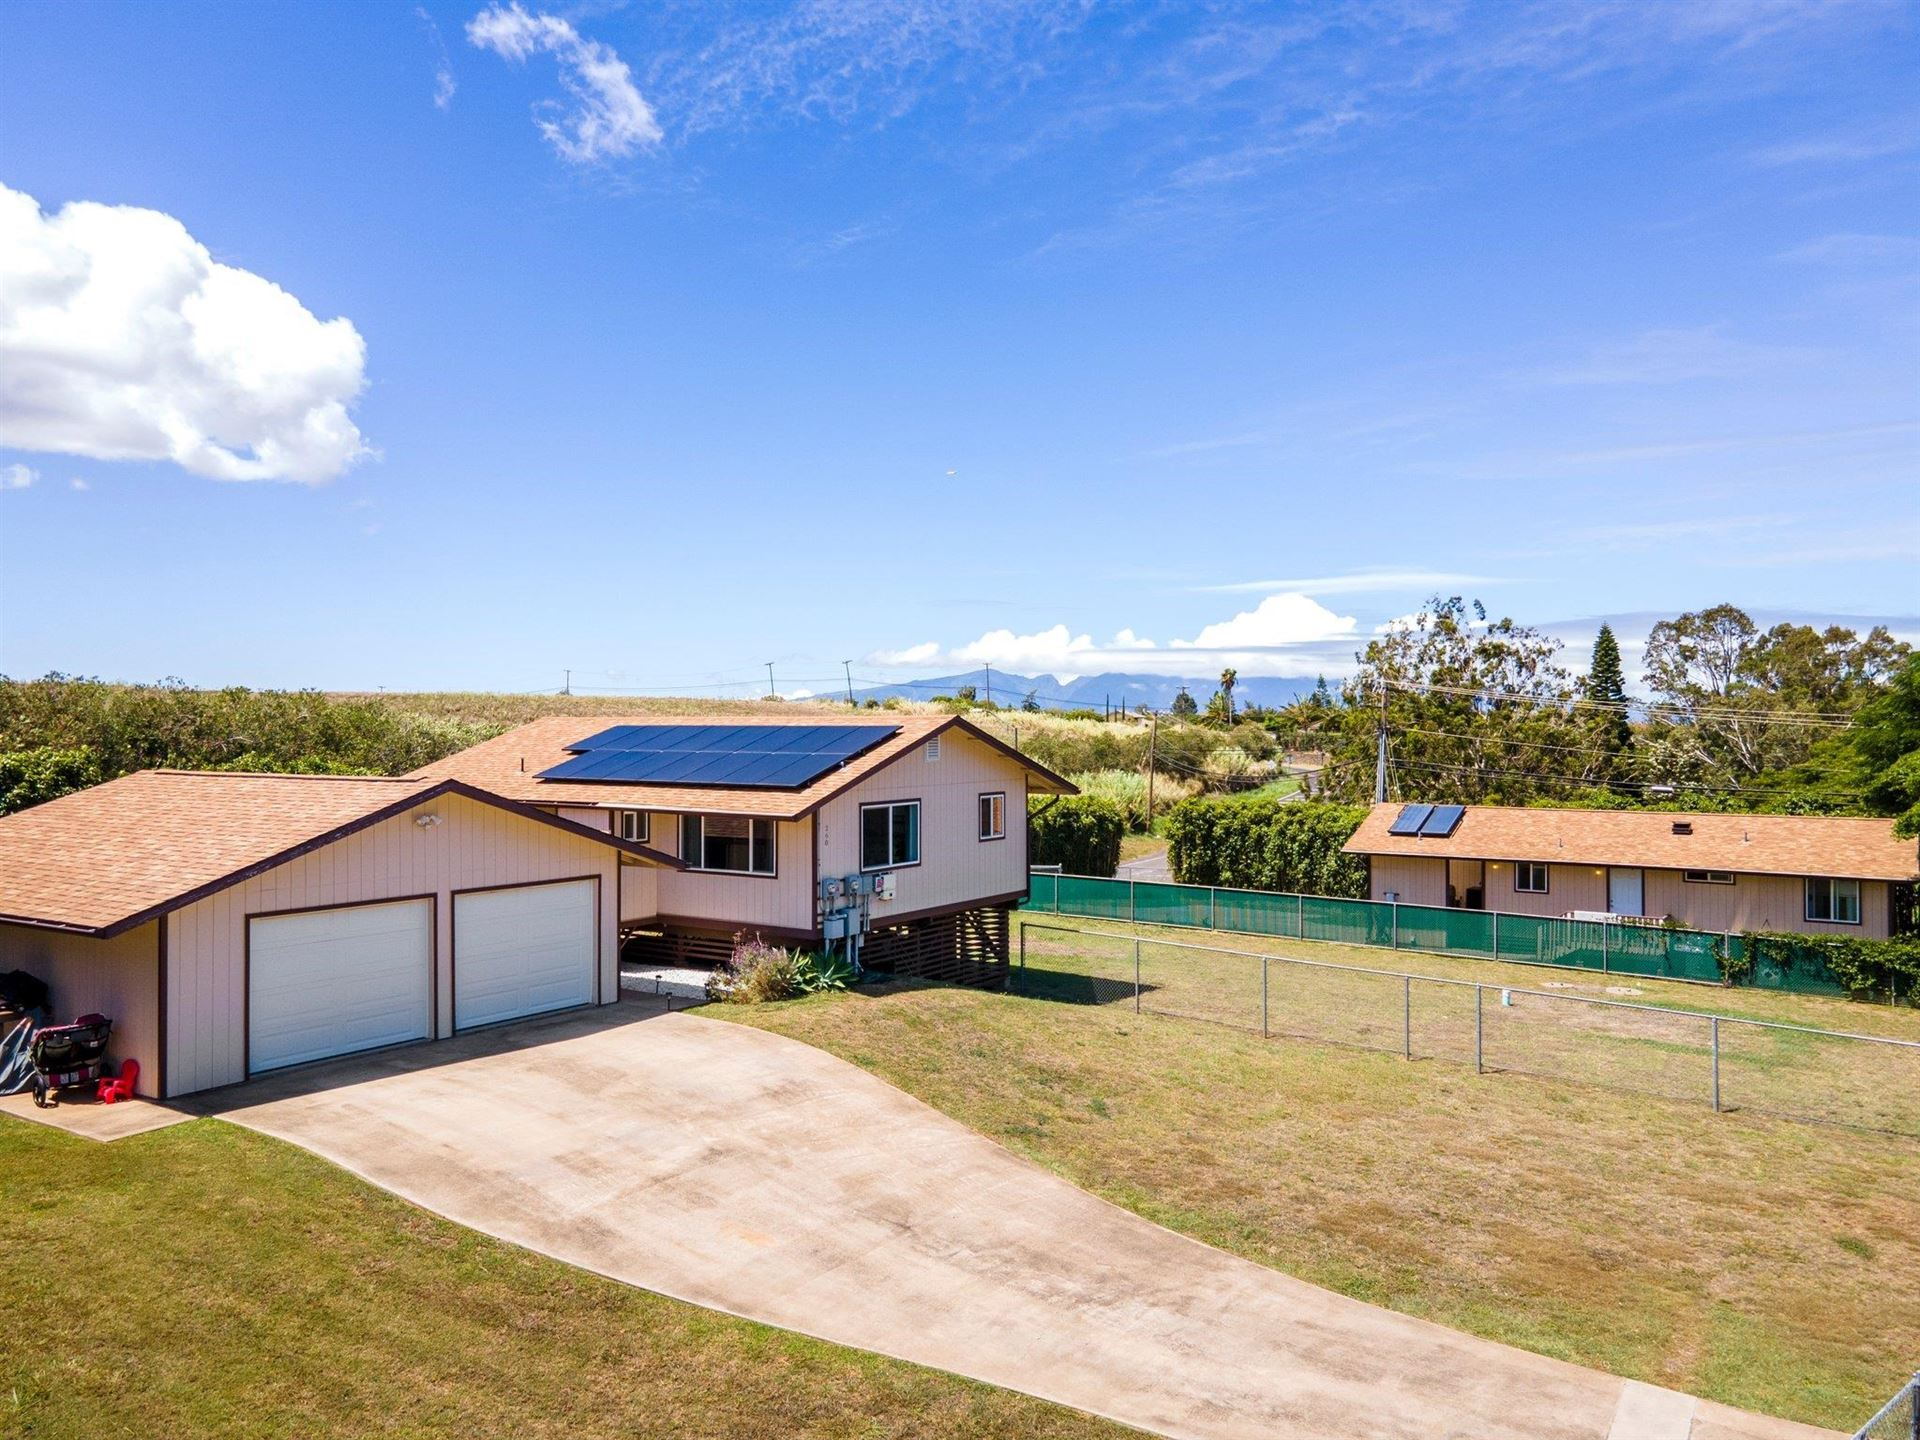 Photo of 260 Kapuahi St, Makawao, HI 96768-8009 (MLS # 393238)